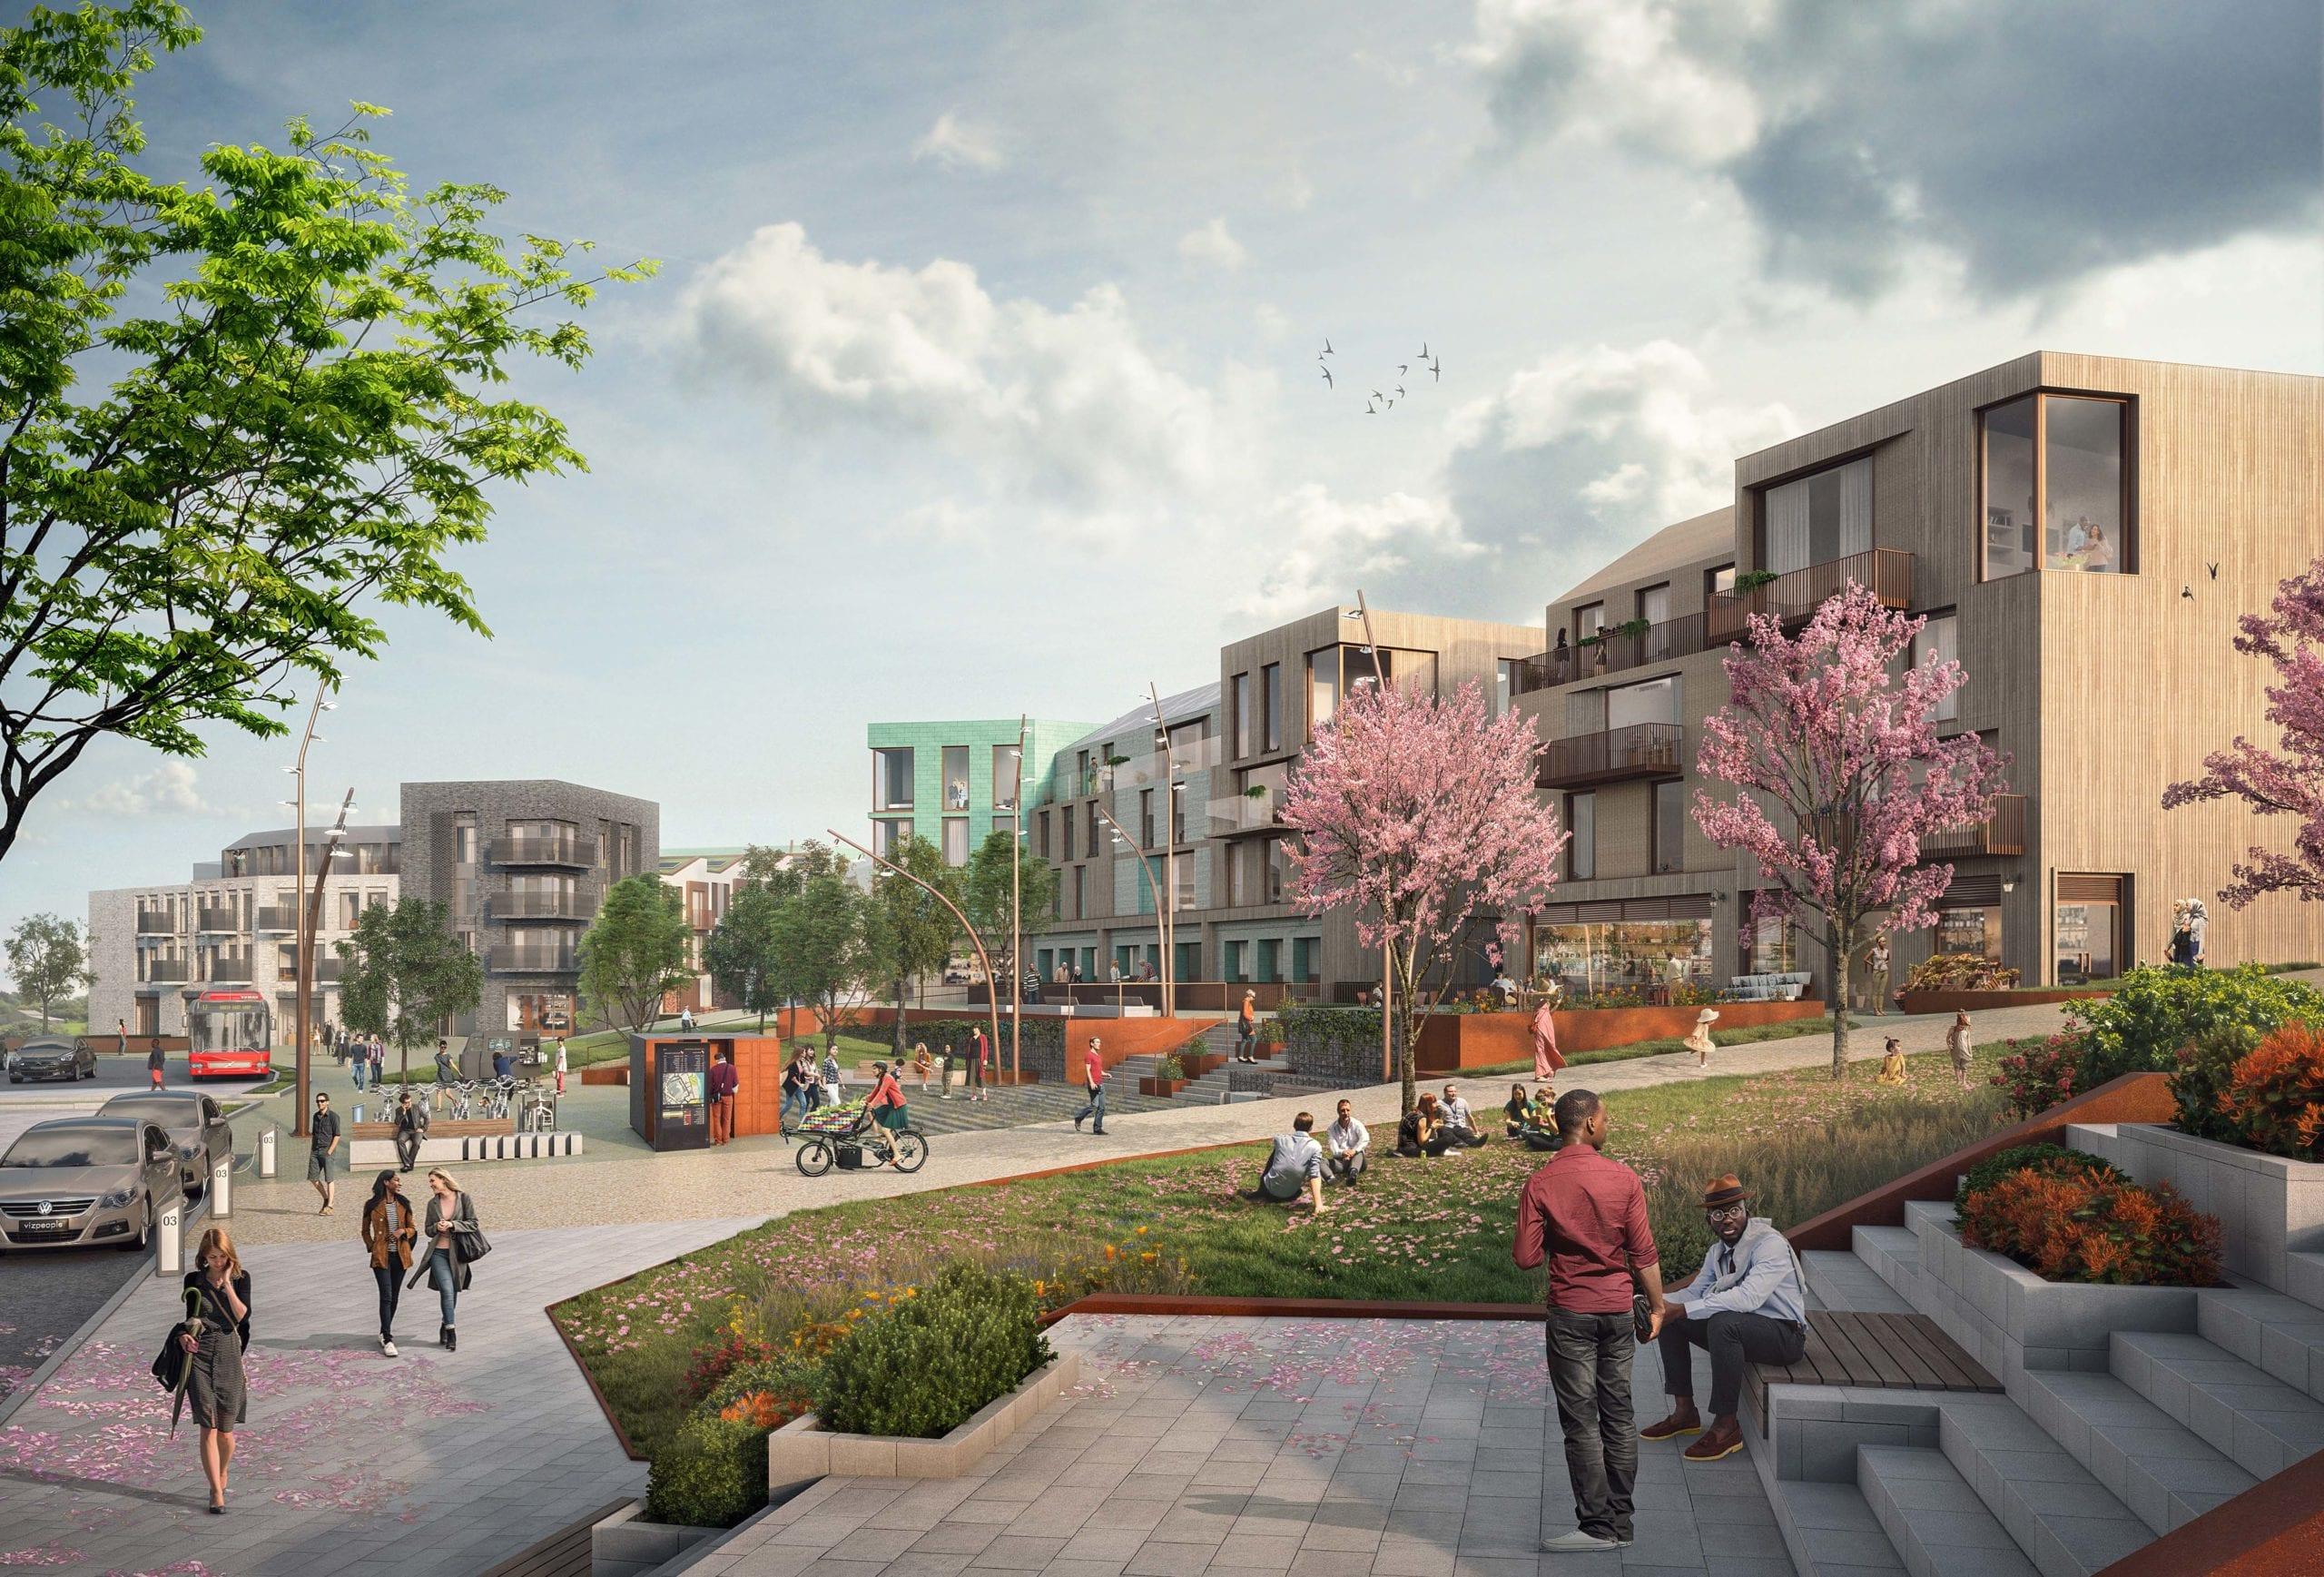 Managing community assets - Langarth Garden Village